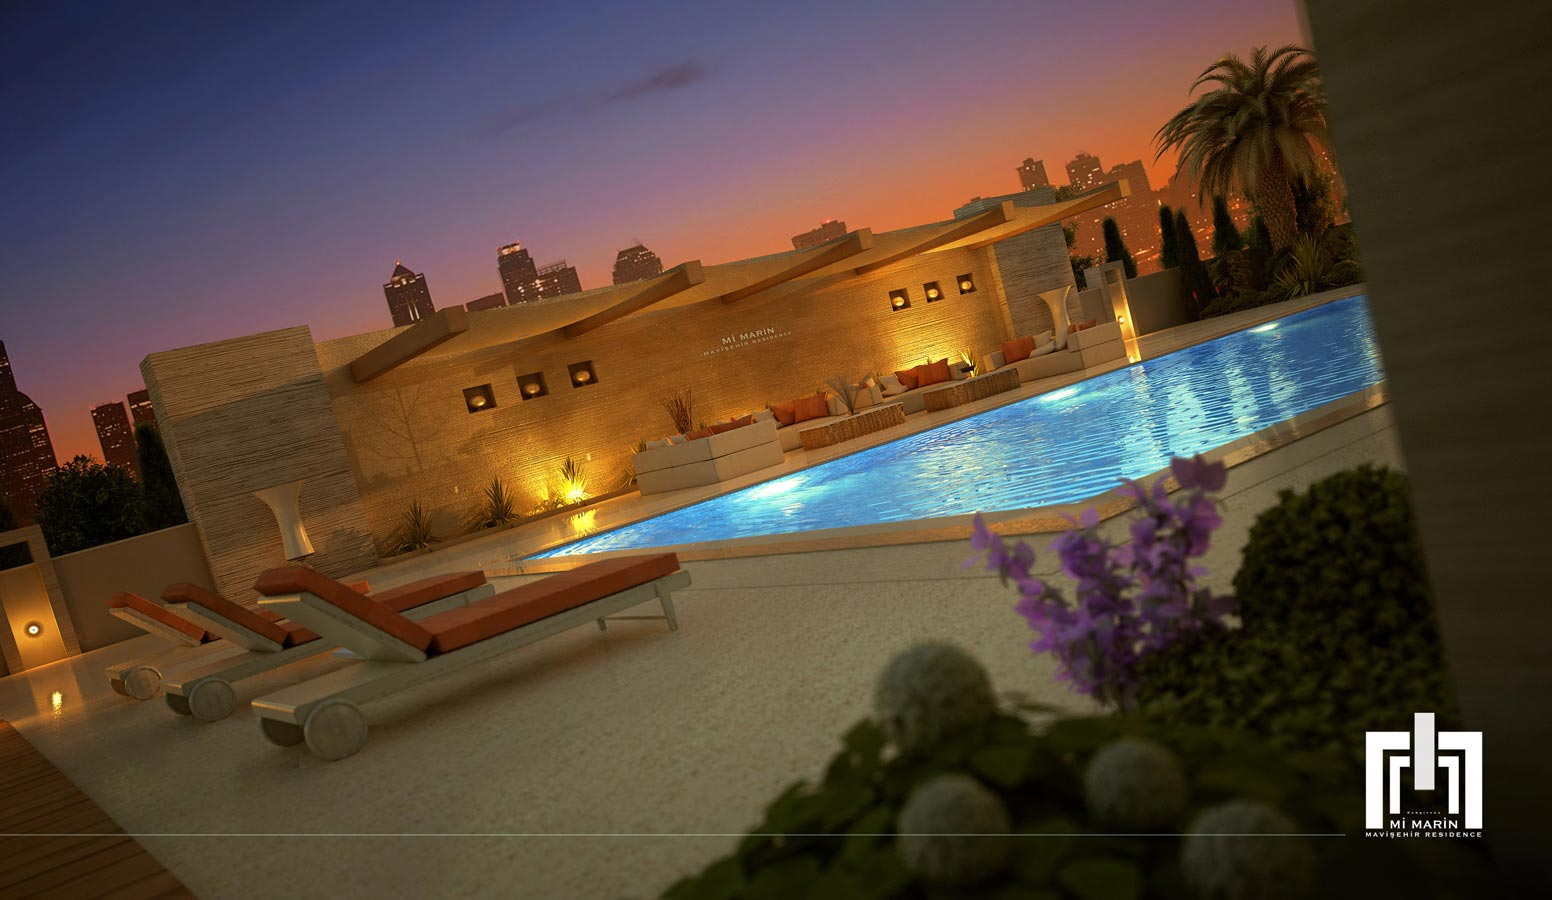 Mi'Marin Mavişehir Residence havuz